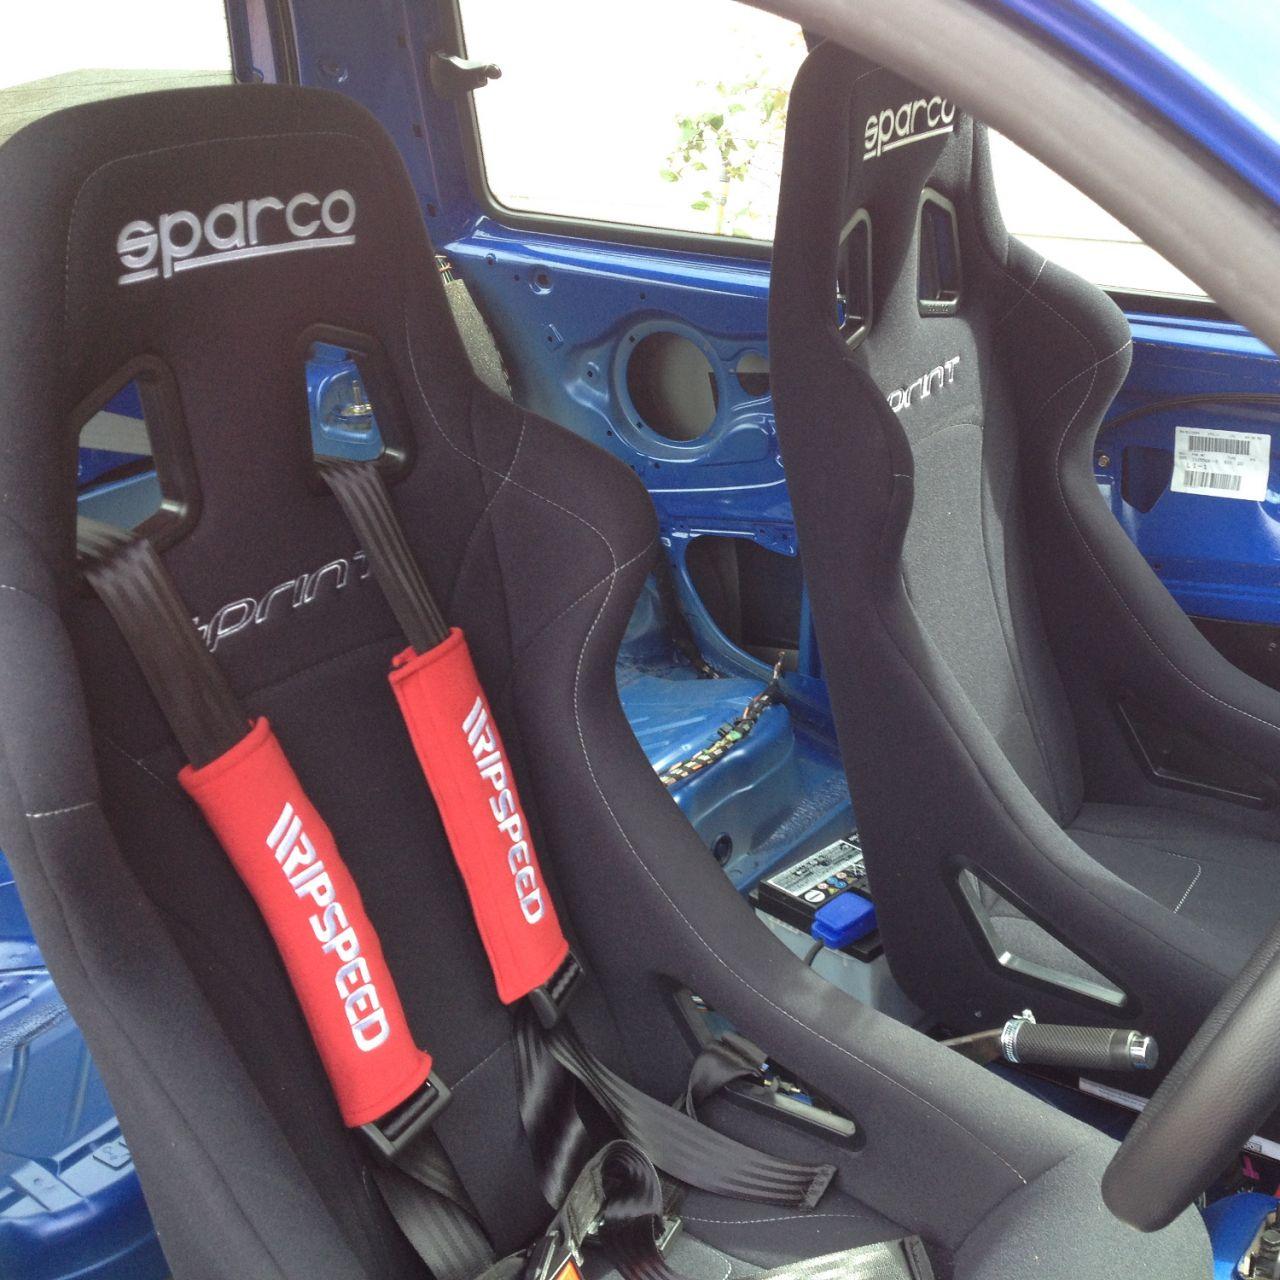 Sprint Car Racing Seats For Sale